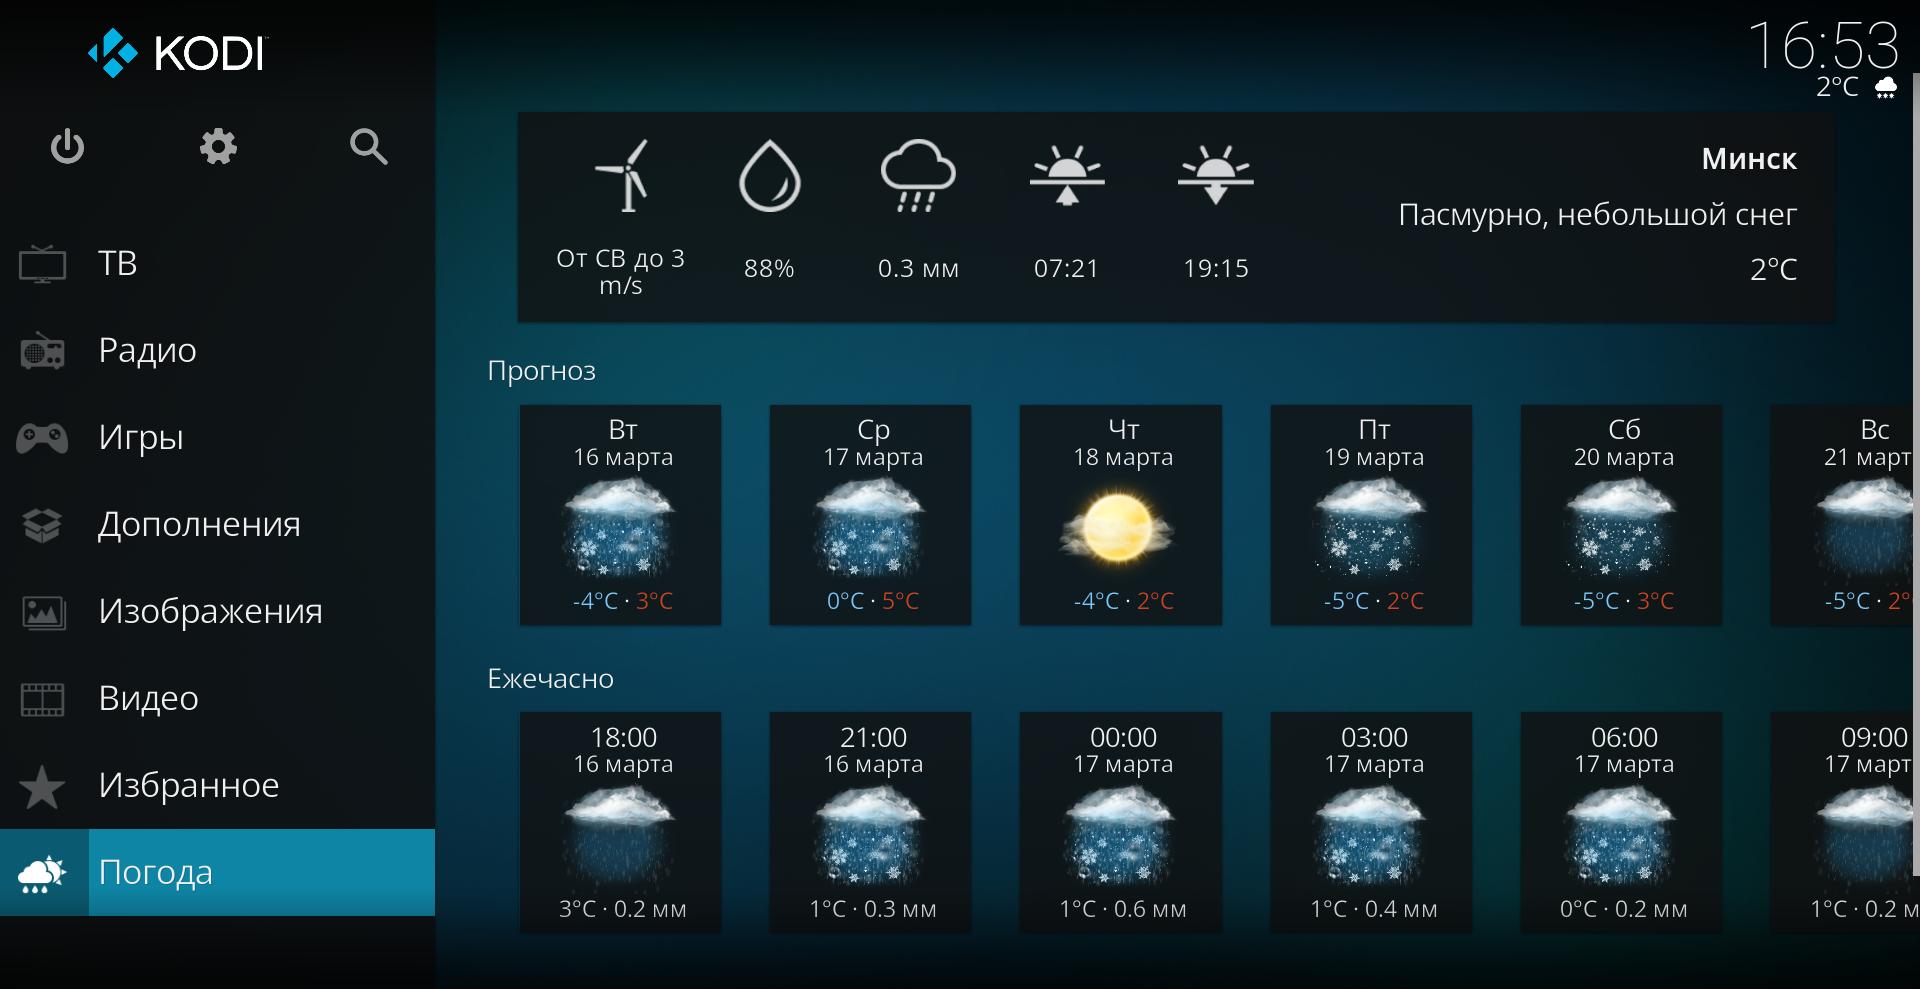 Раздел погода на главном экране